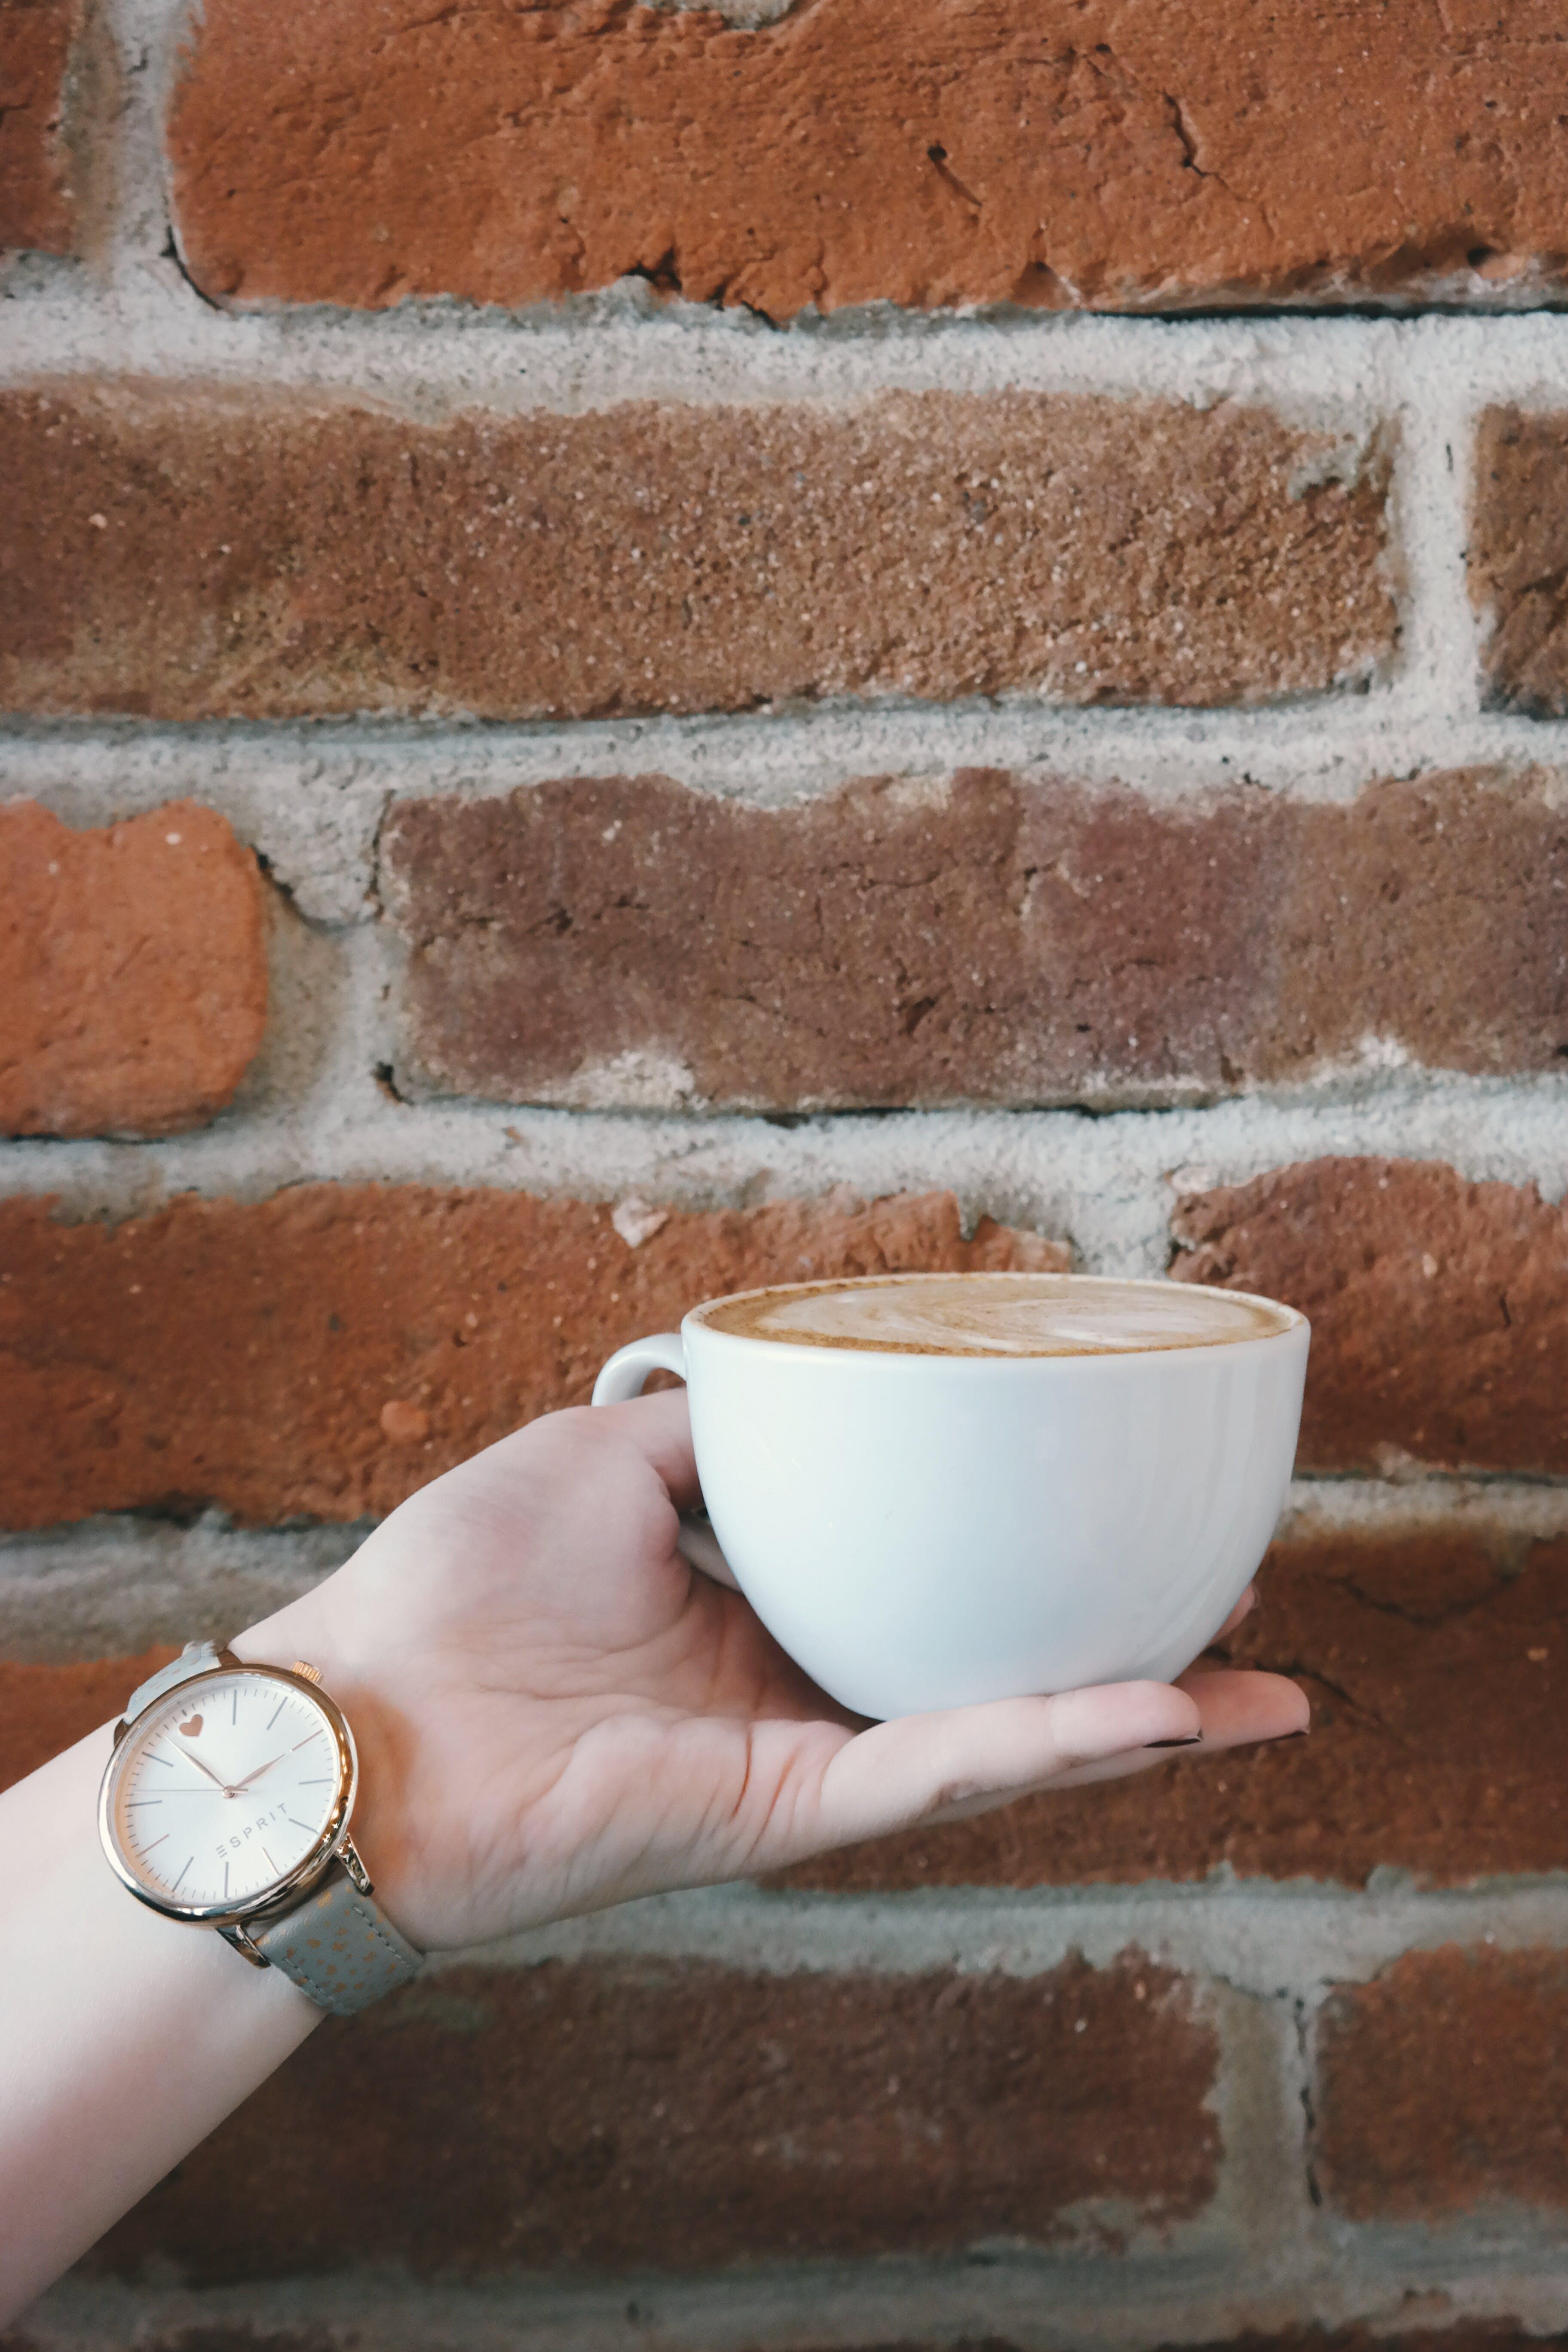 Gratis stockfoto met Analoog horloge, cafeïne, cappuccino, drank